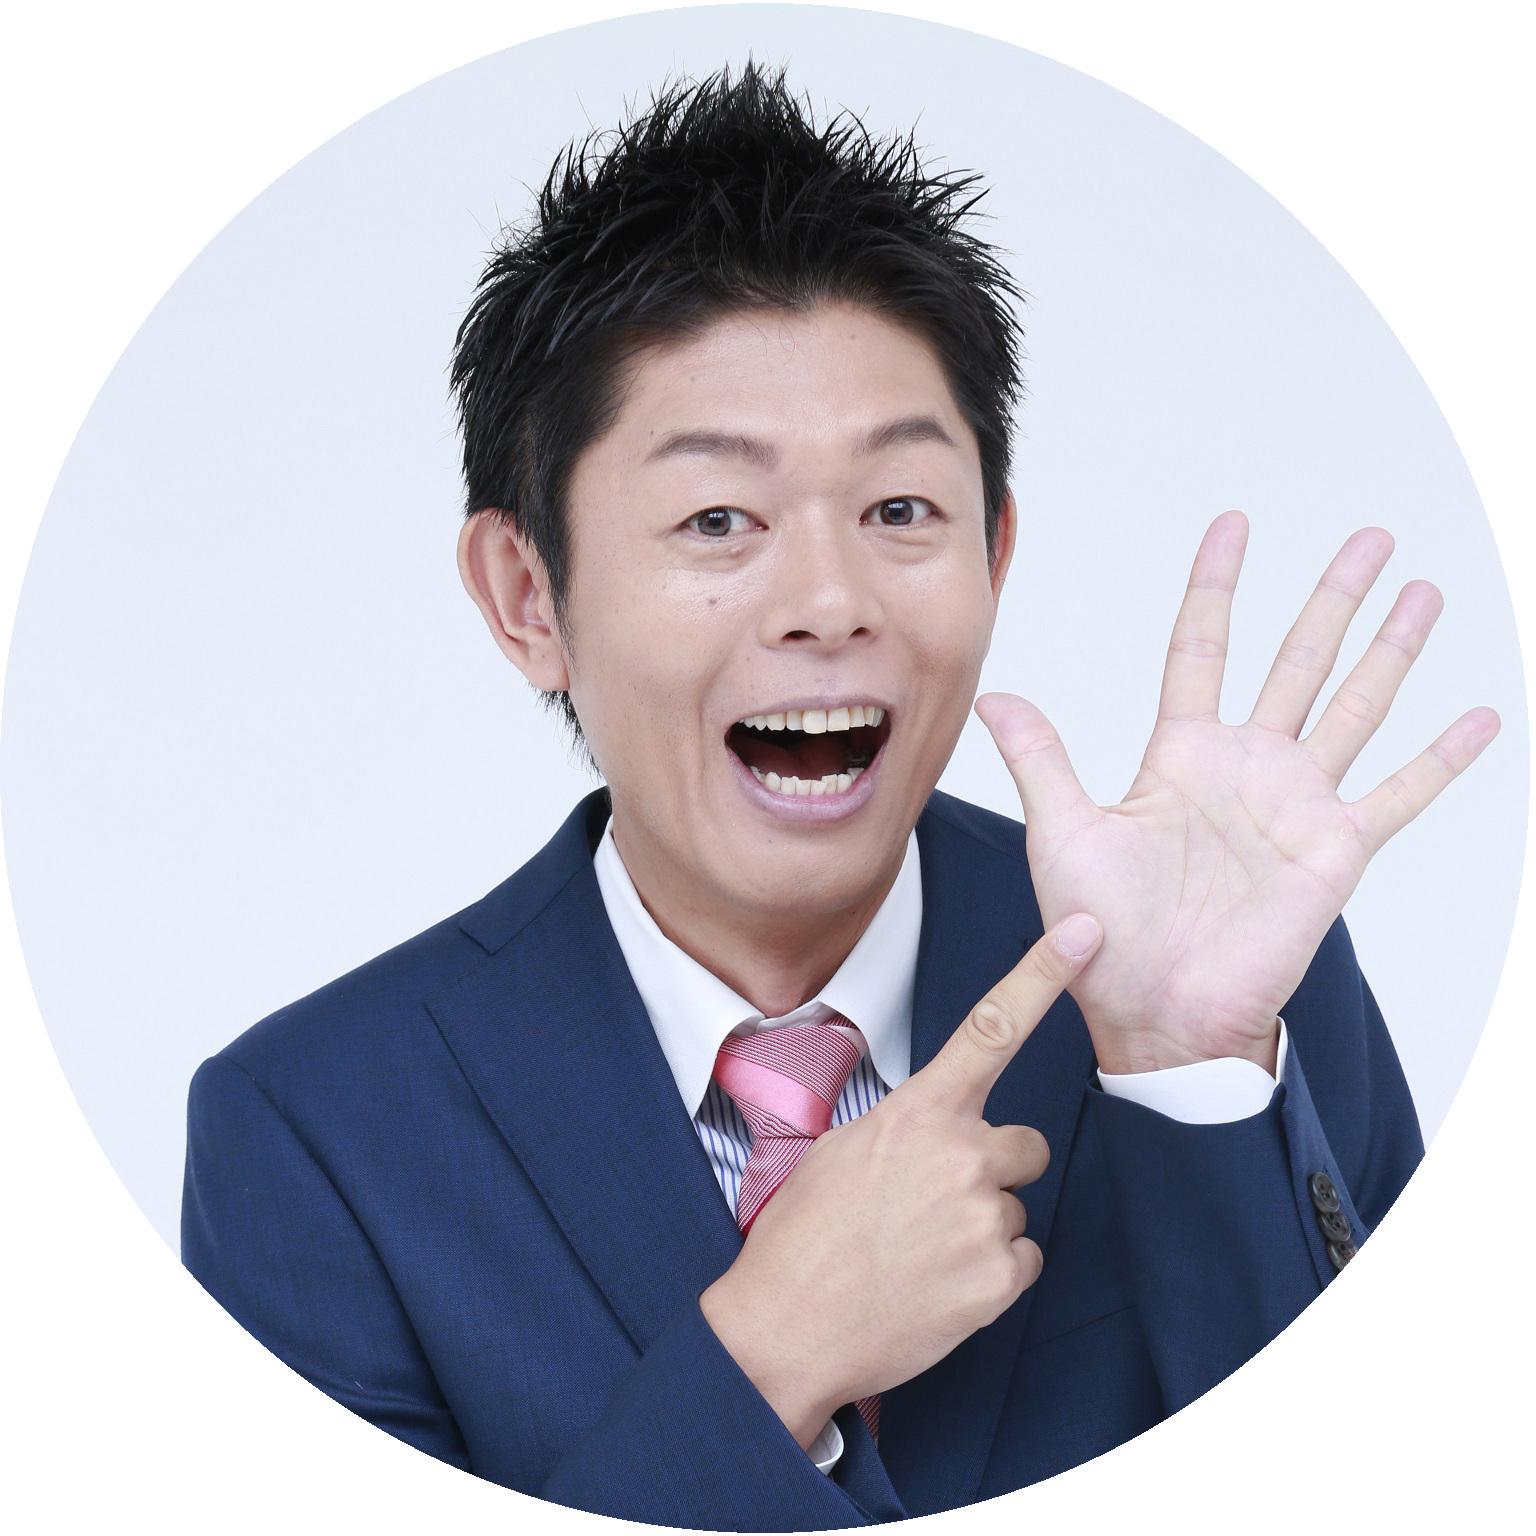 【WANCOTT4周年記念イベント】4月25日(日)島田秀平さん 開運トークショー開催!!